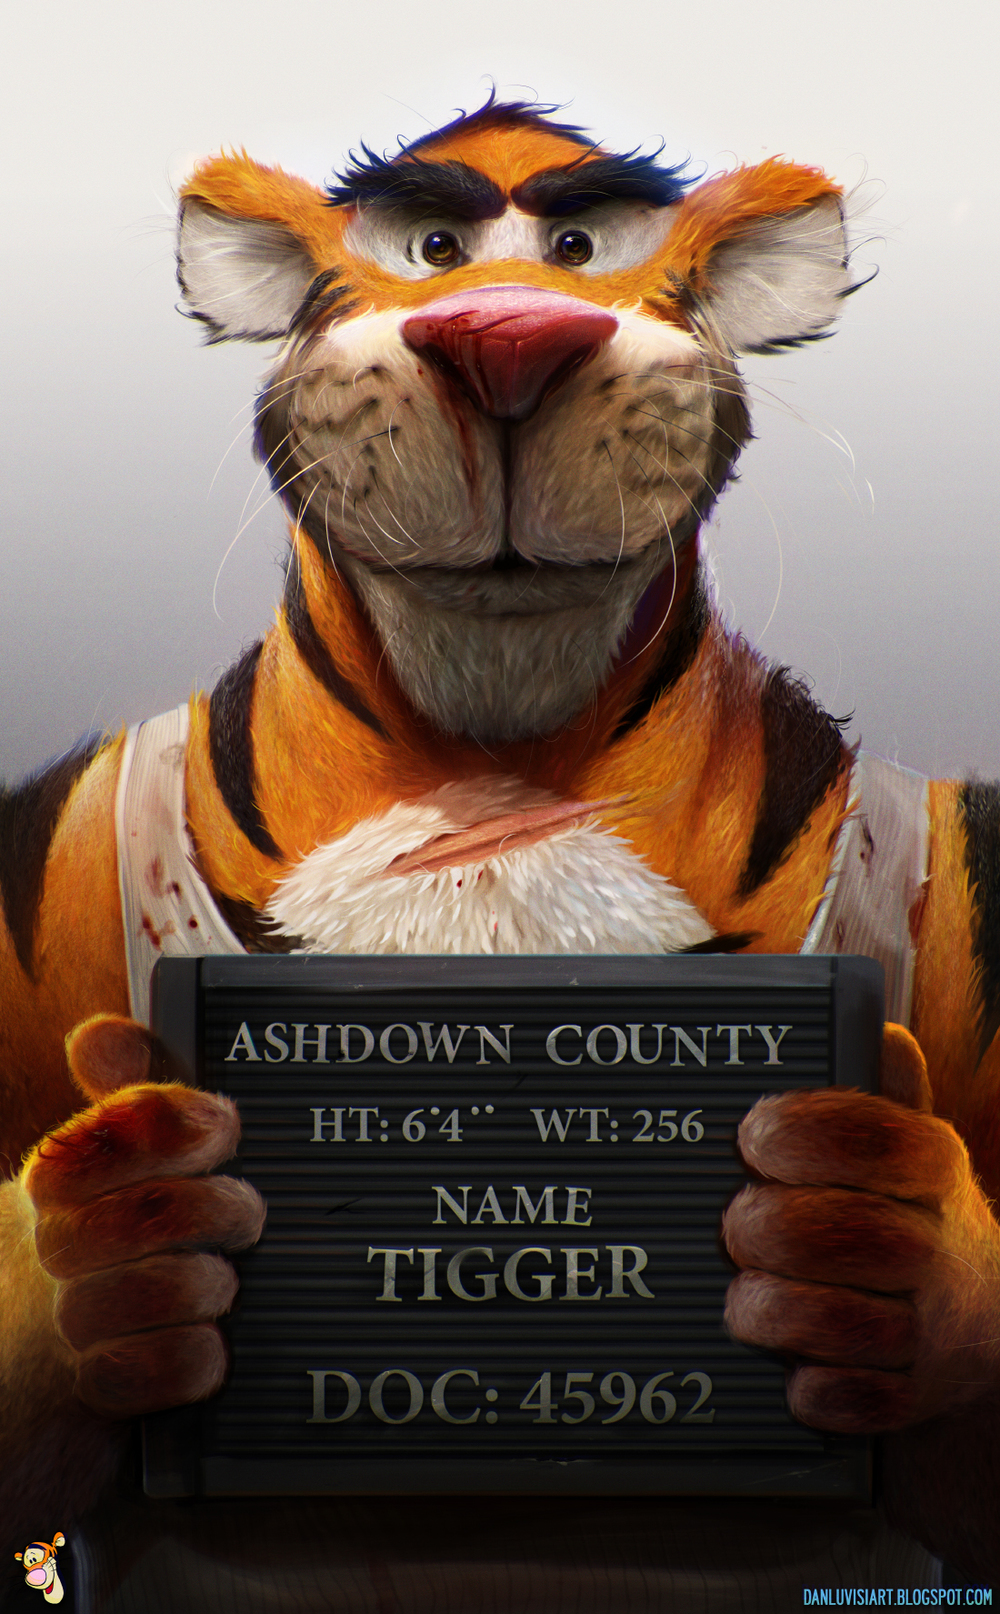 hardcore-tigger-mugshot-art-from-winnie-the-pooh